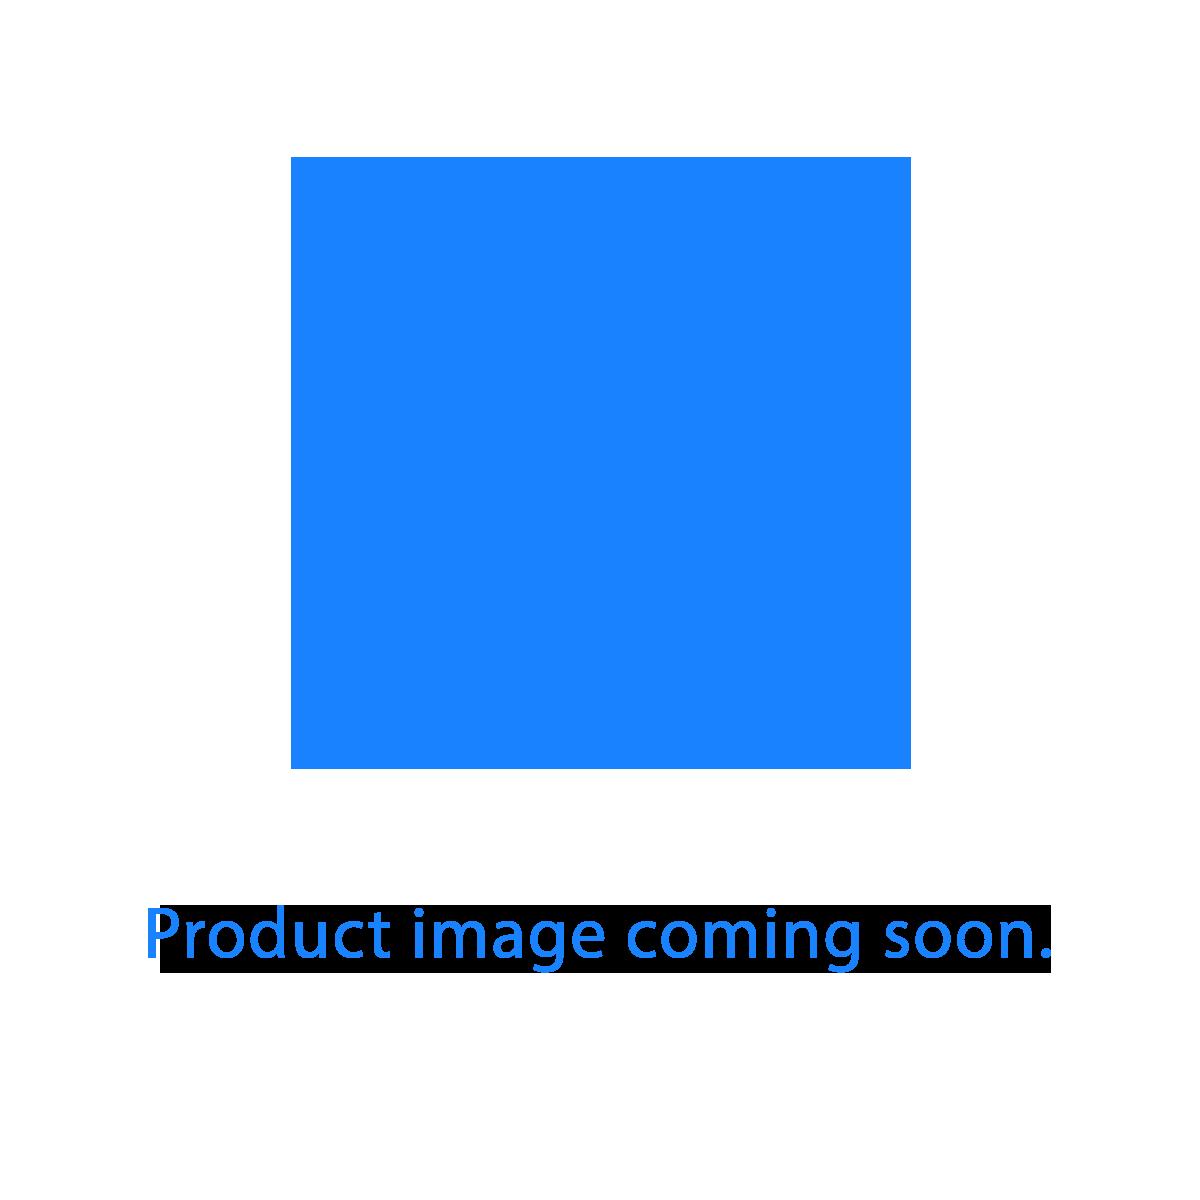 ASUS Zenbook 14X OLED UX5400EG-KN178T